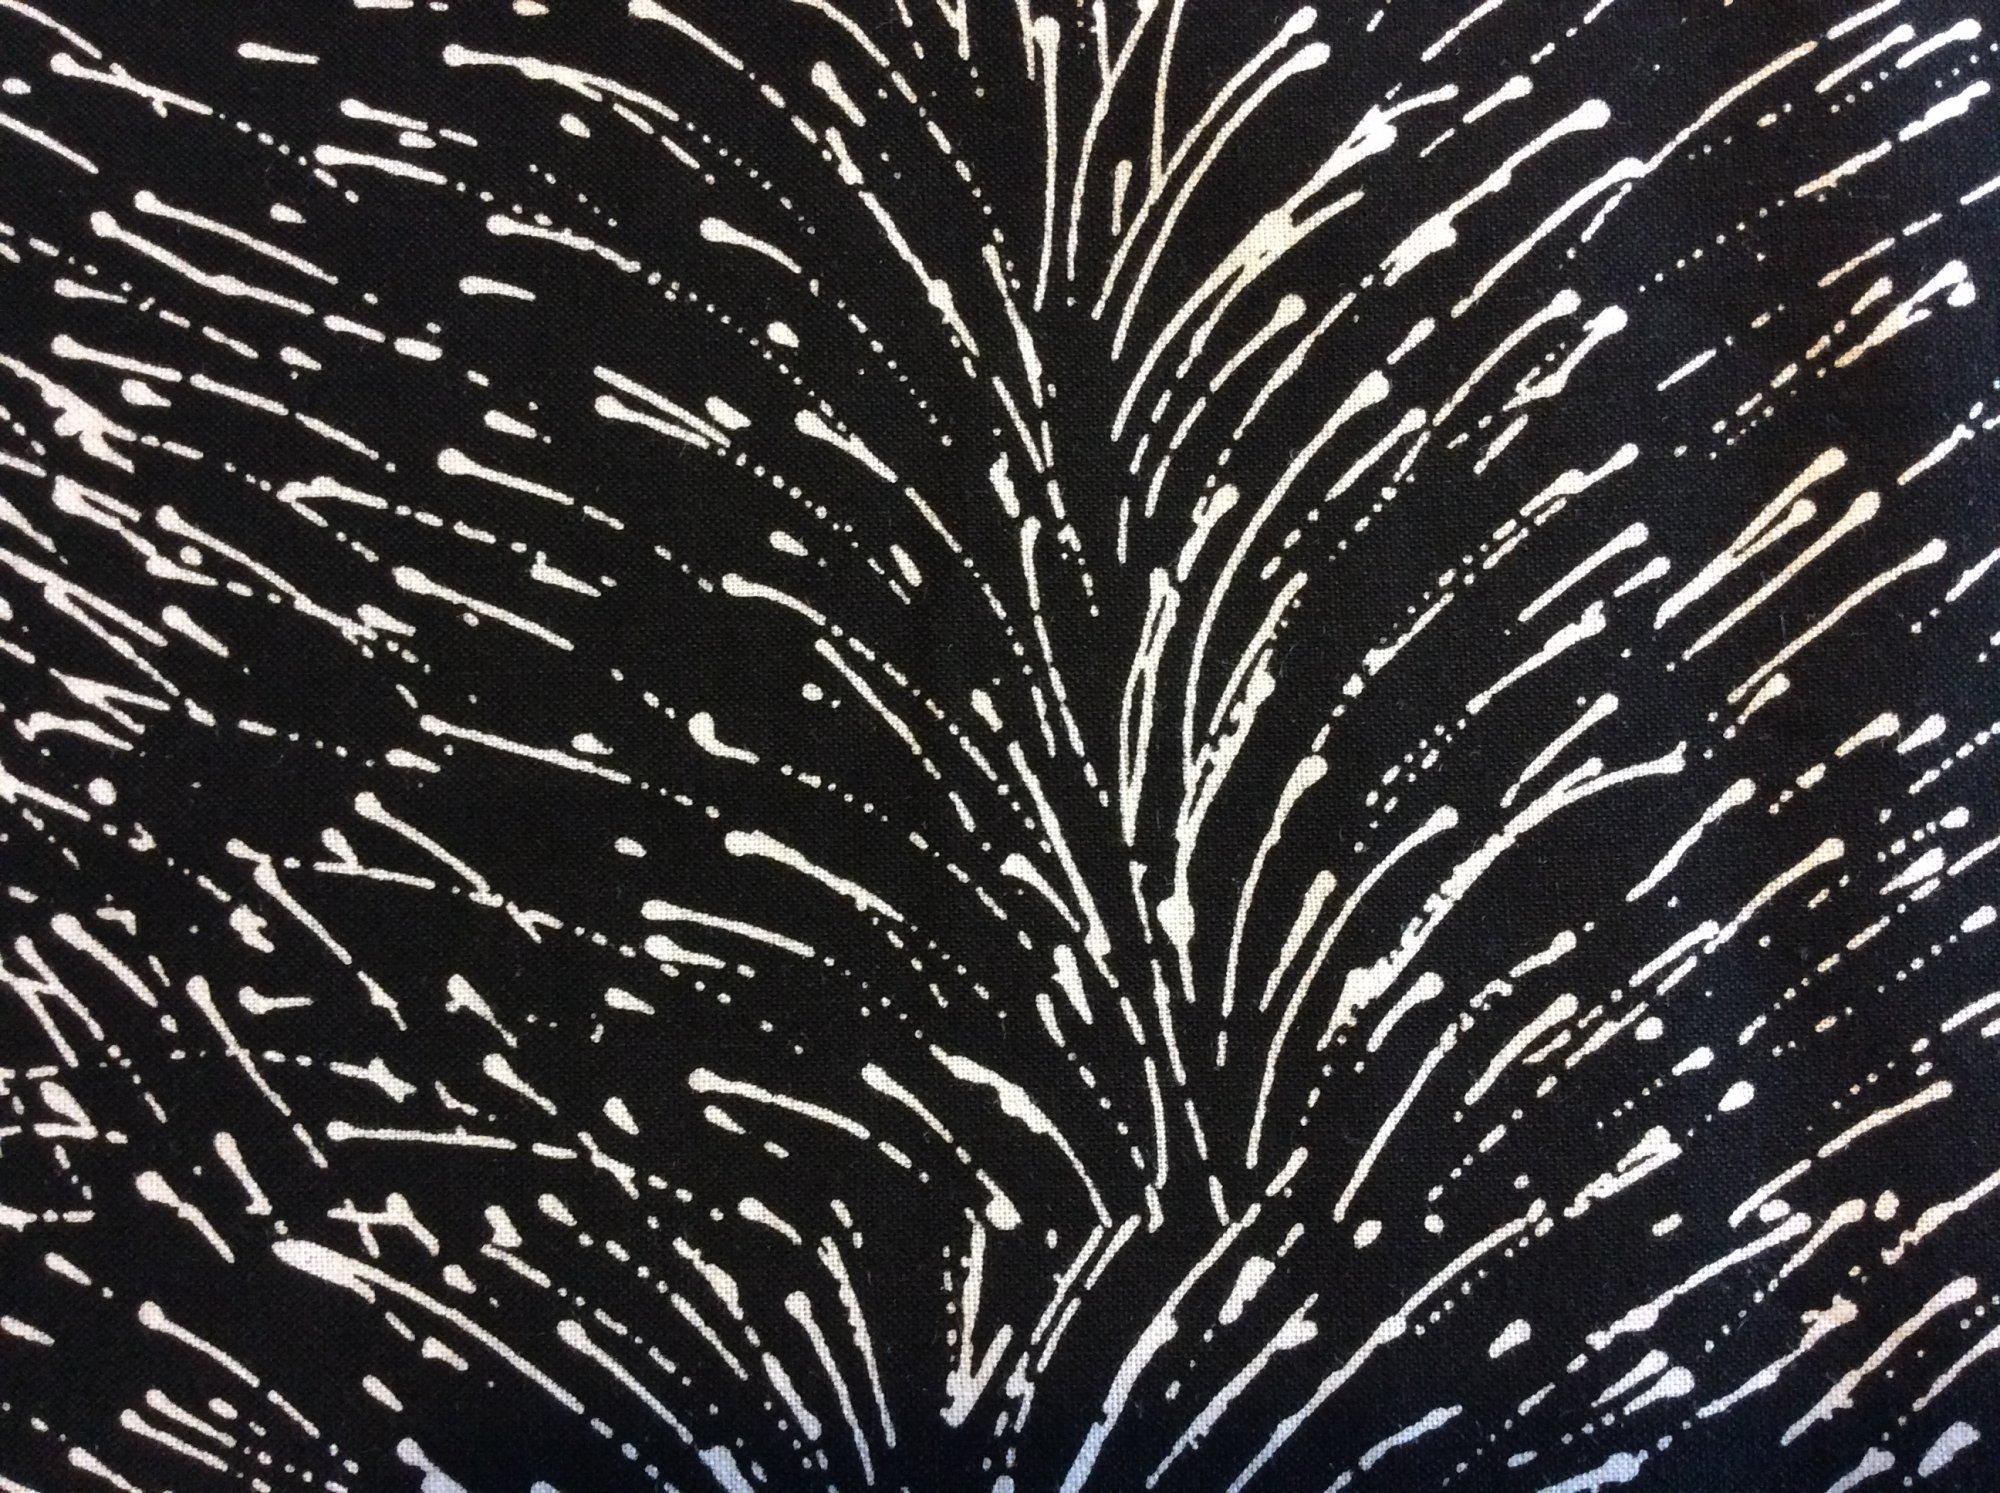 MS01 Modern Splatter Rain Drop Storm Australia Aborigine Quilting Cotton Fabric